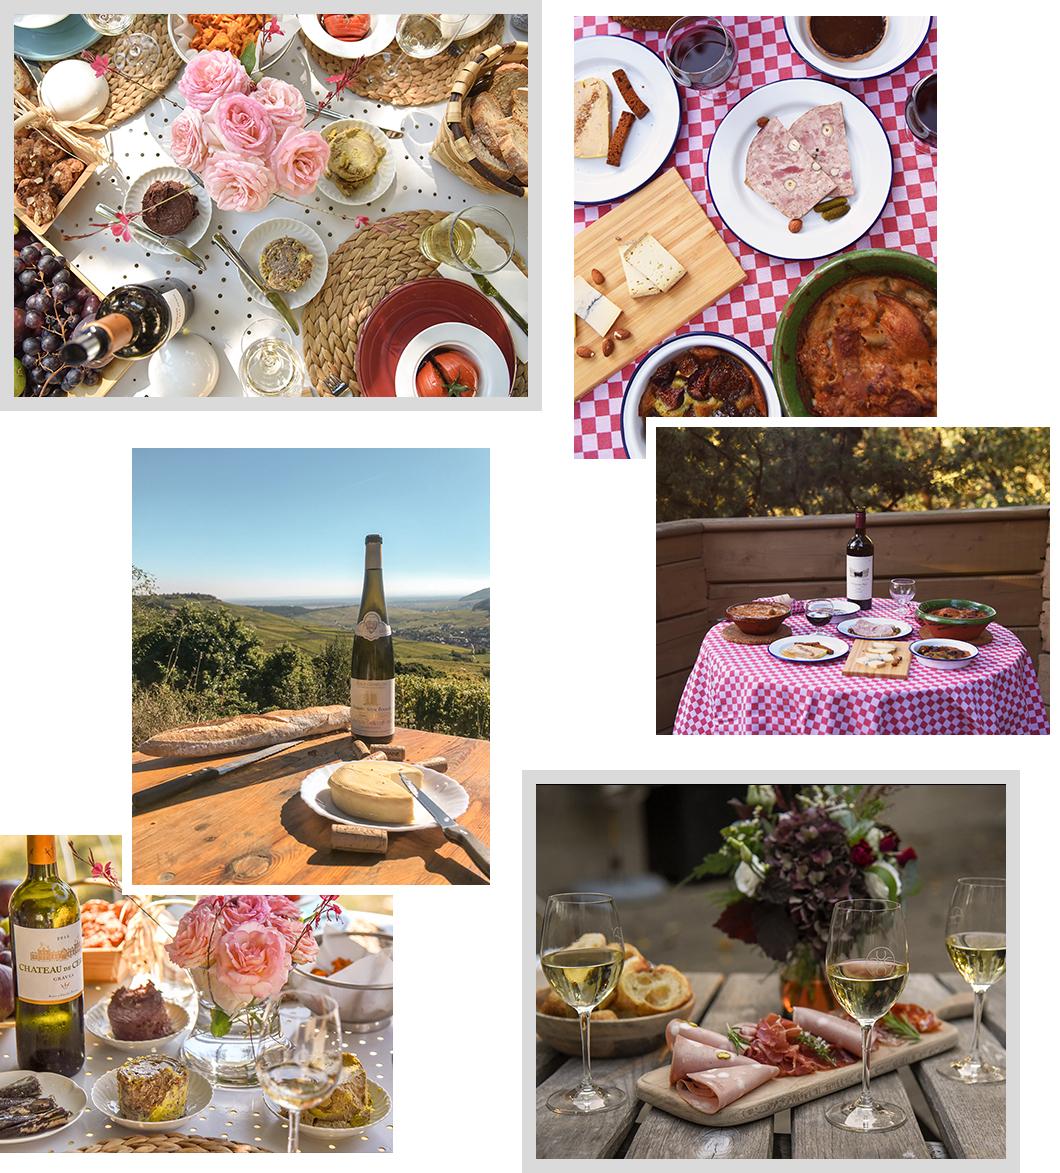 Gastronomie en France